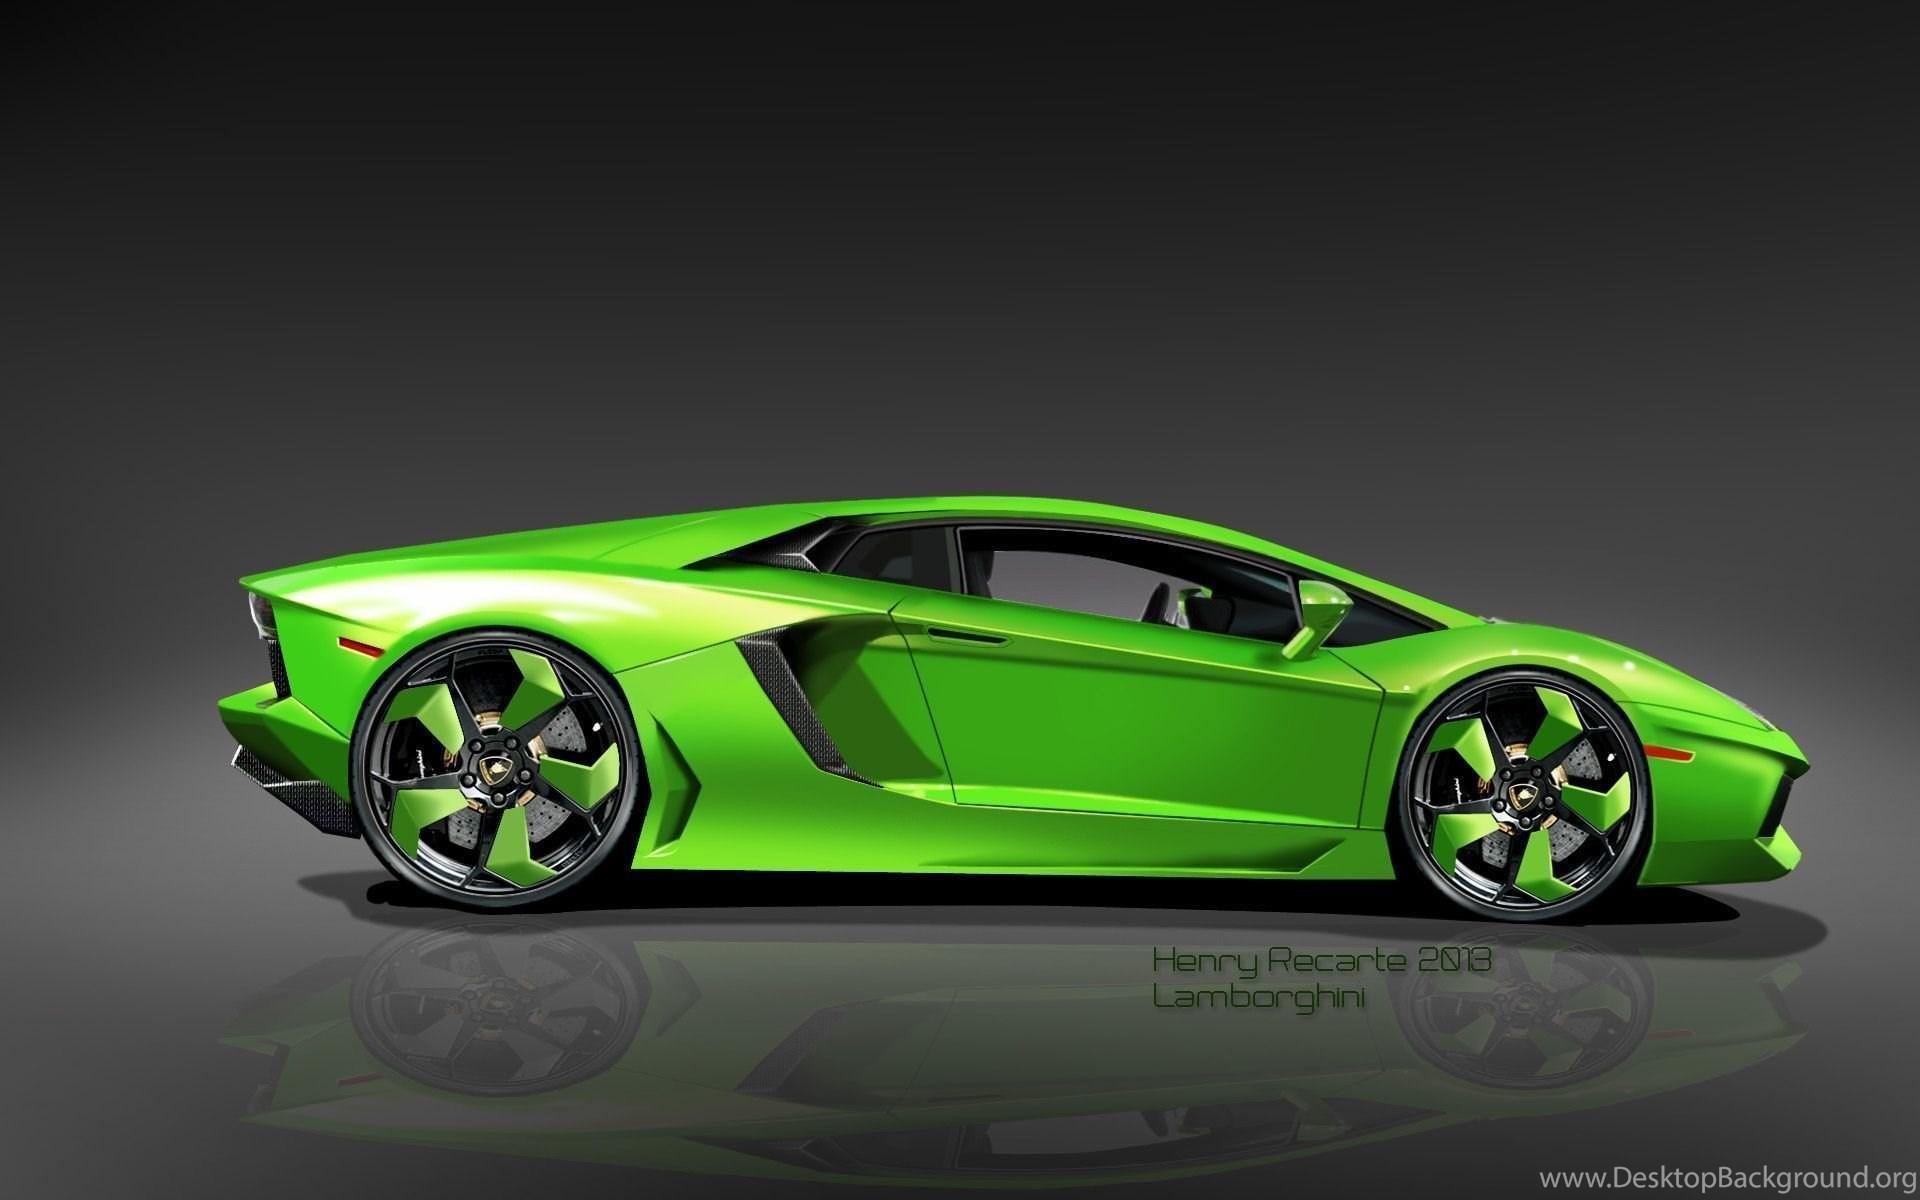 Green Lamborghini Wallpapers High Quality • Cars ...